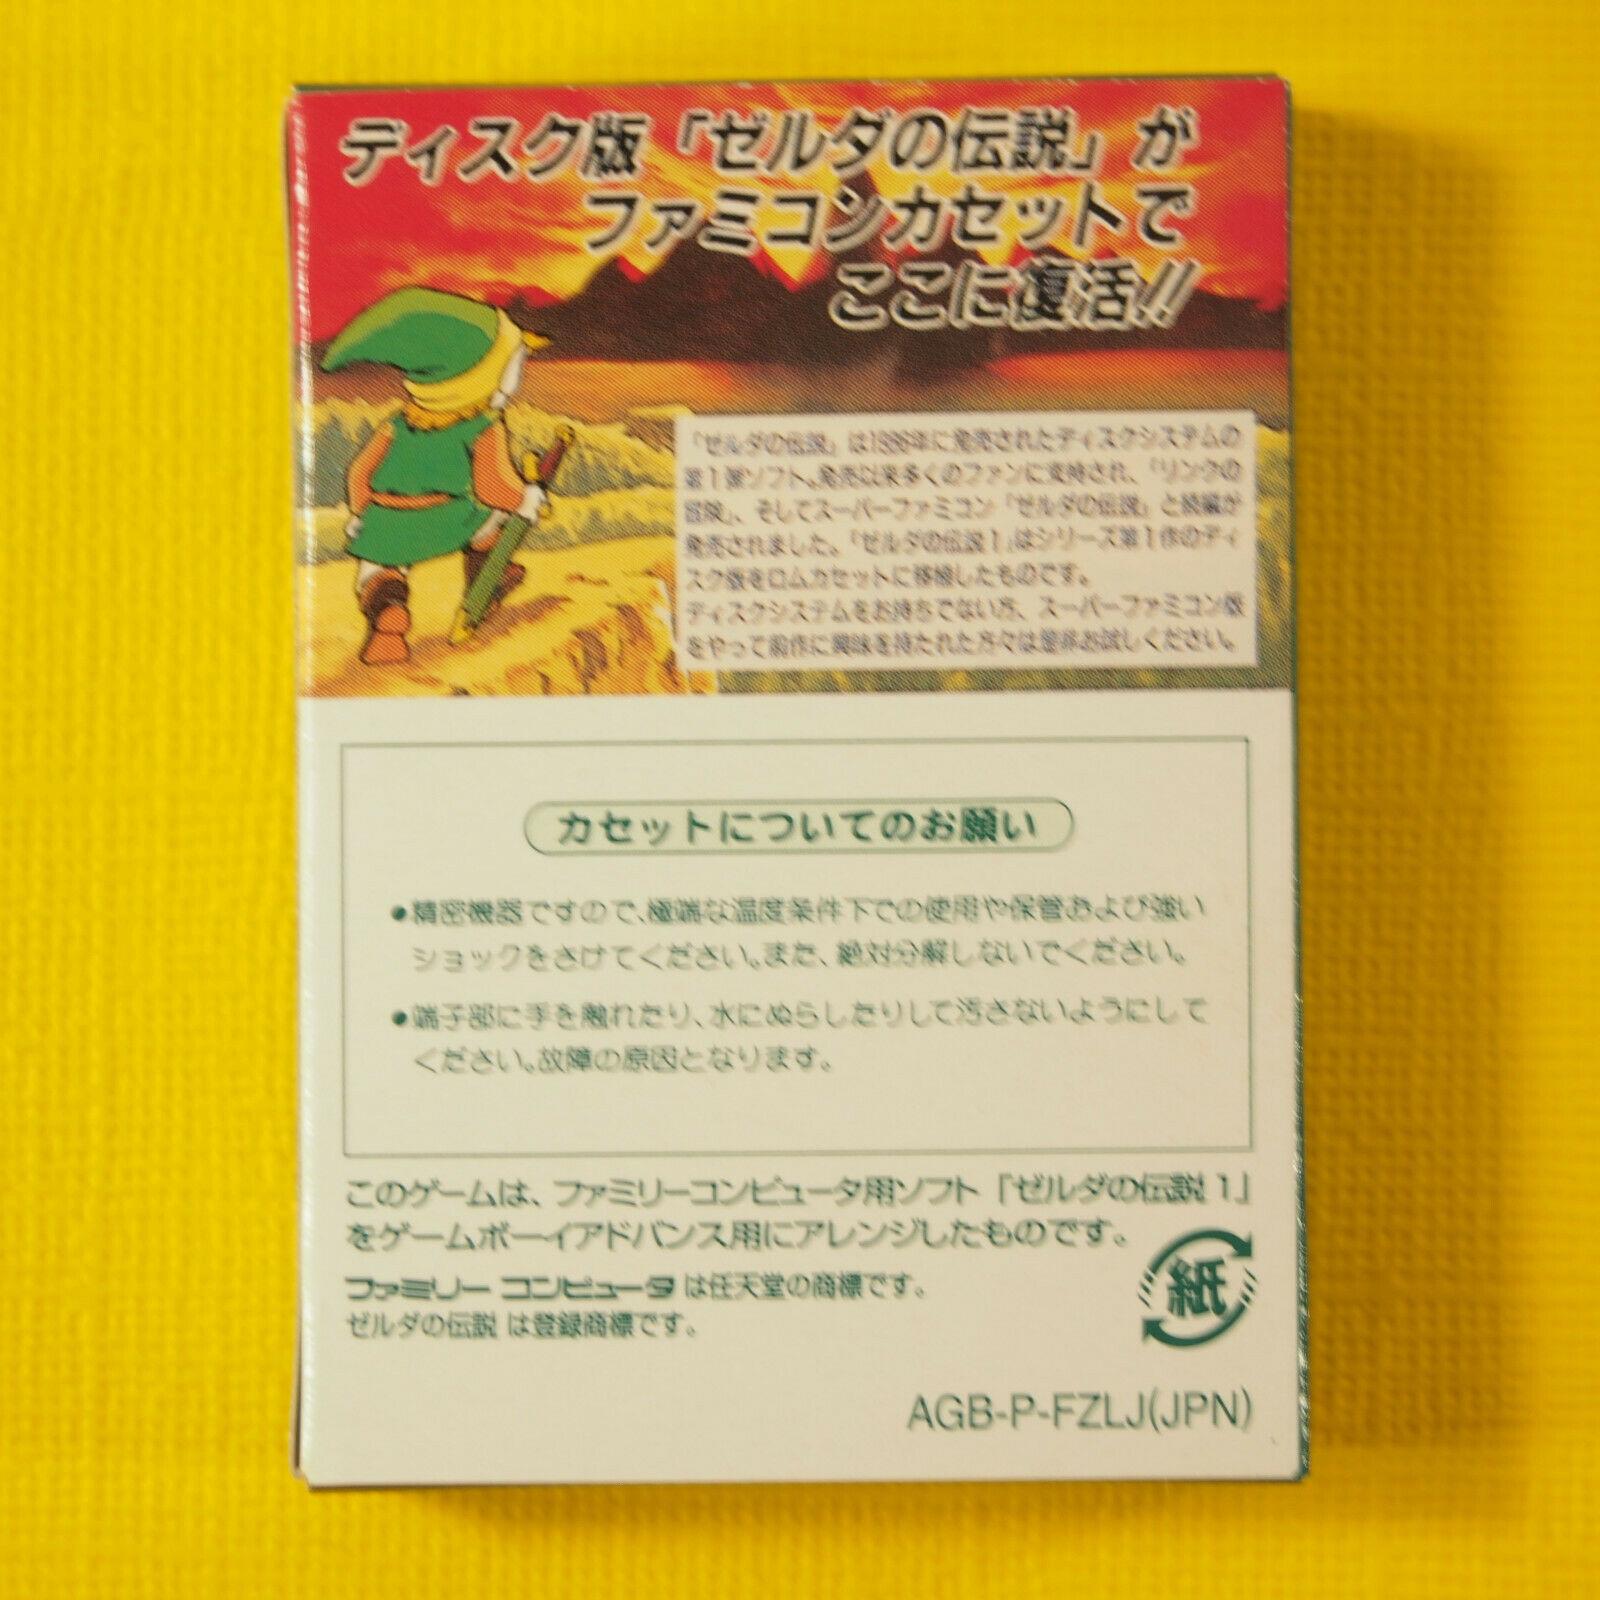 Legend of Zelda: Famicom Mini Complete (Nintendo Gameboy Advance GBA 2004) Japan image 5